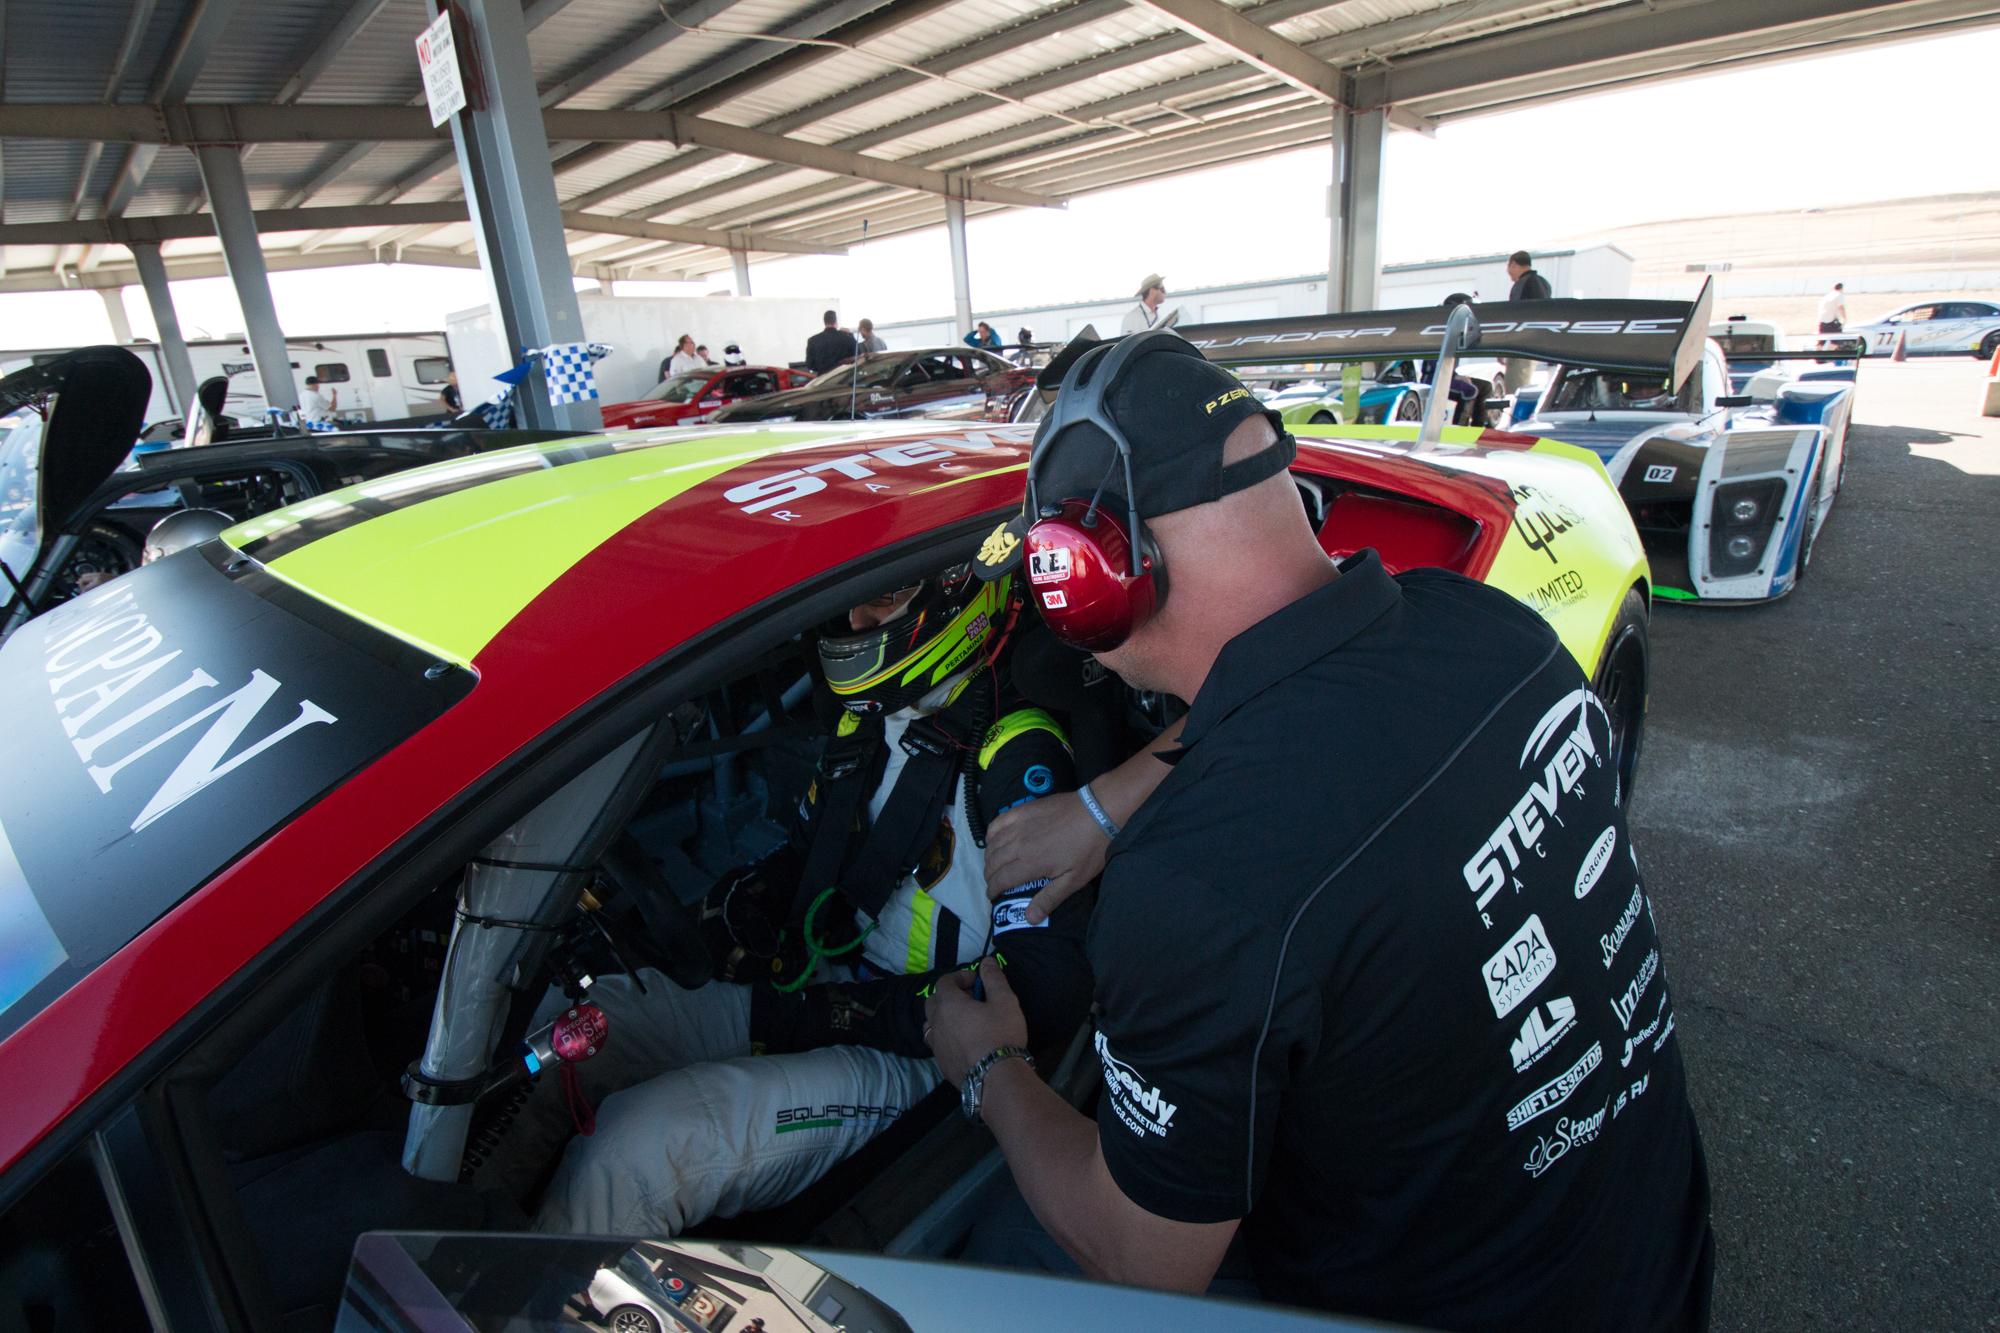 Steven-Racing-20130208-45822.jpg